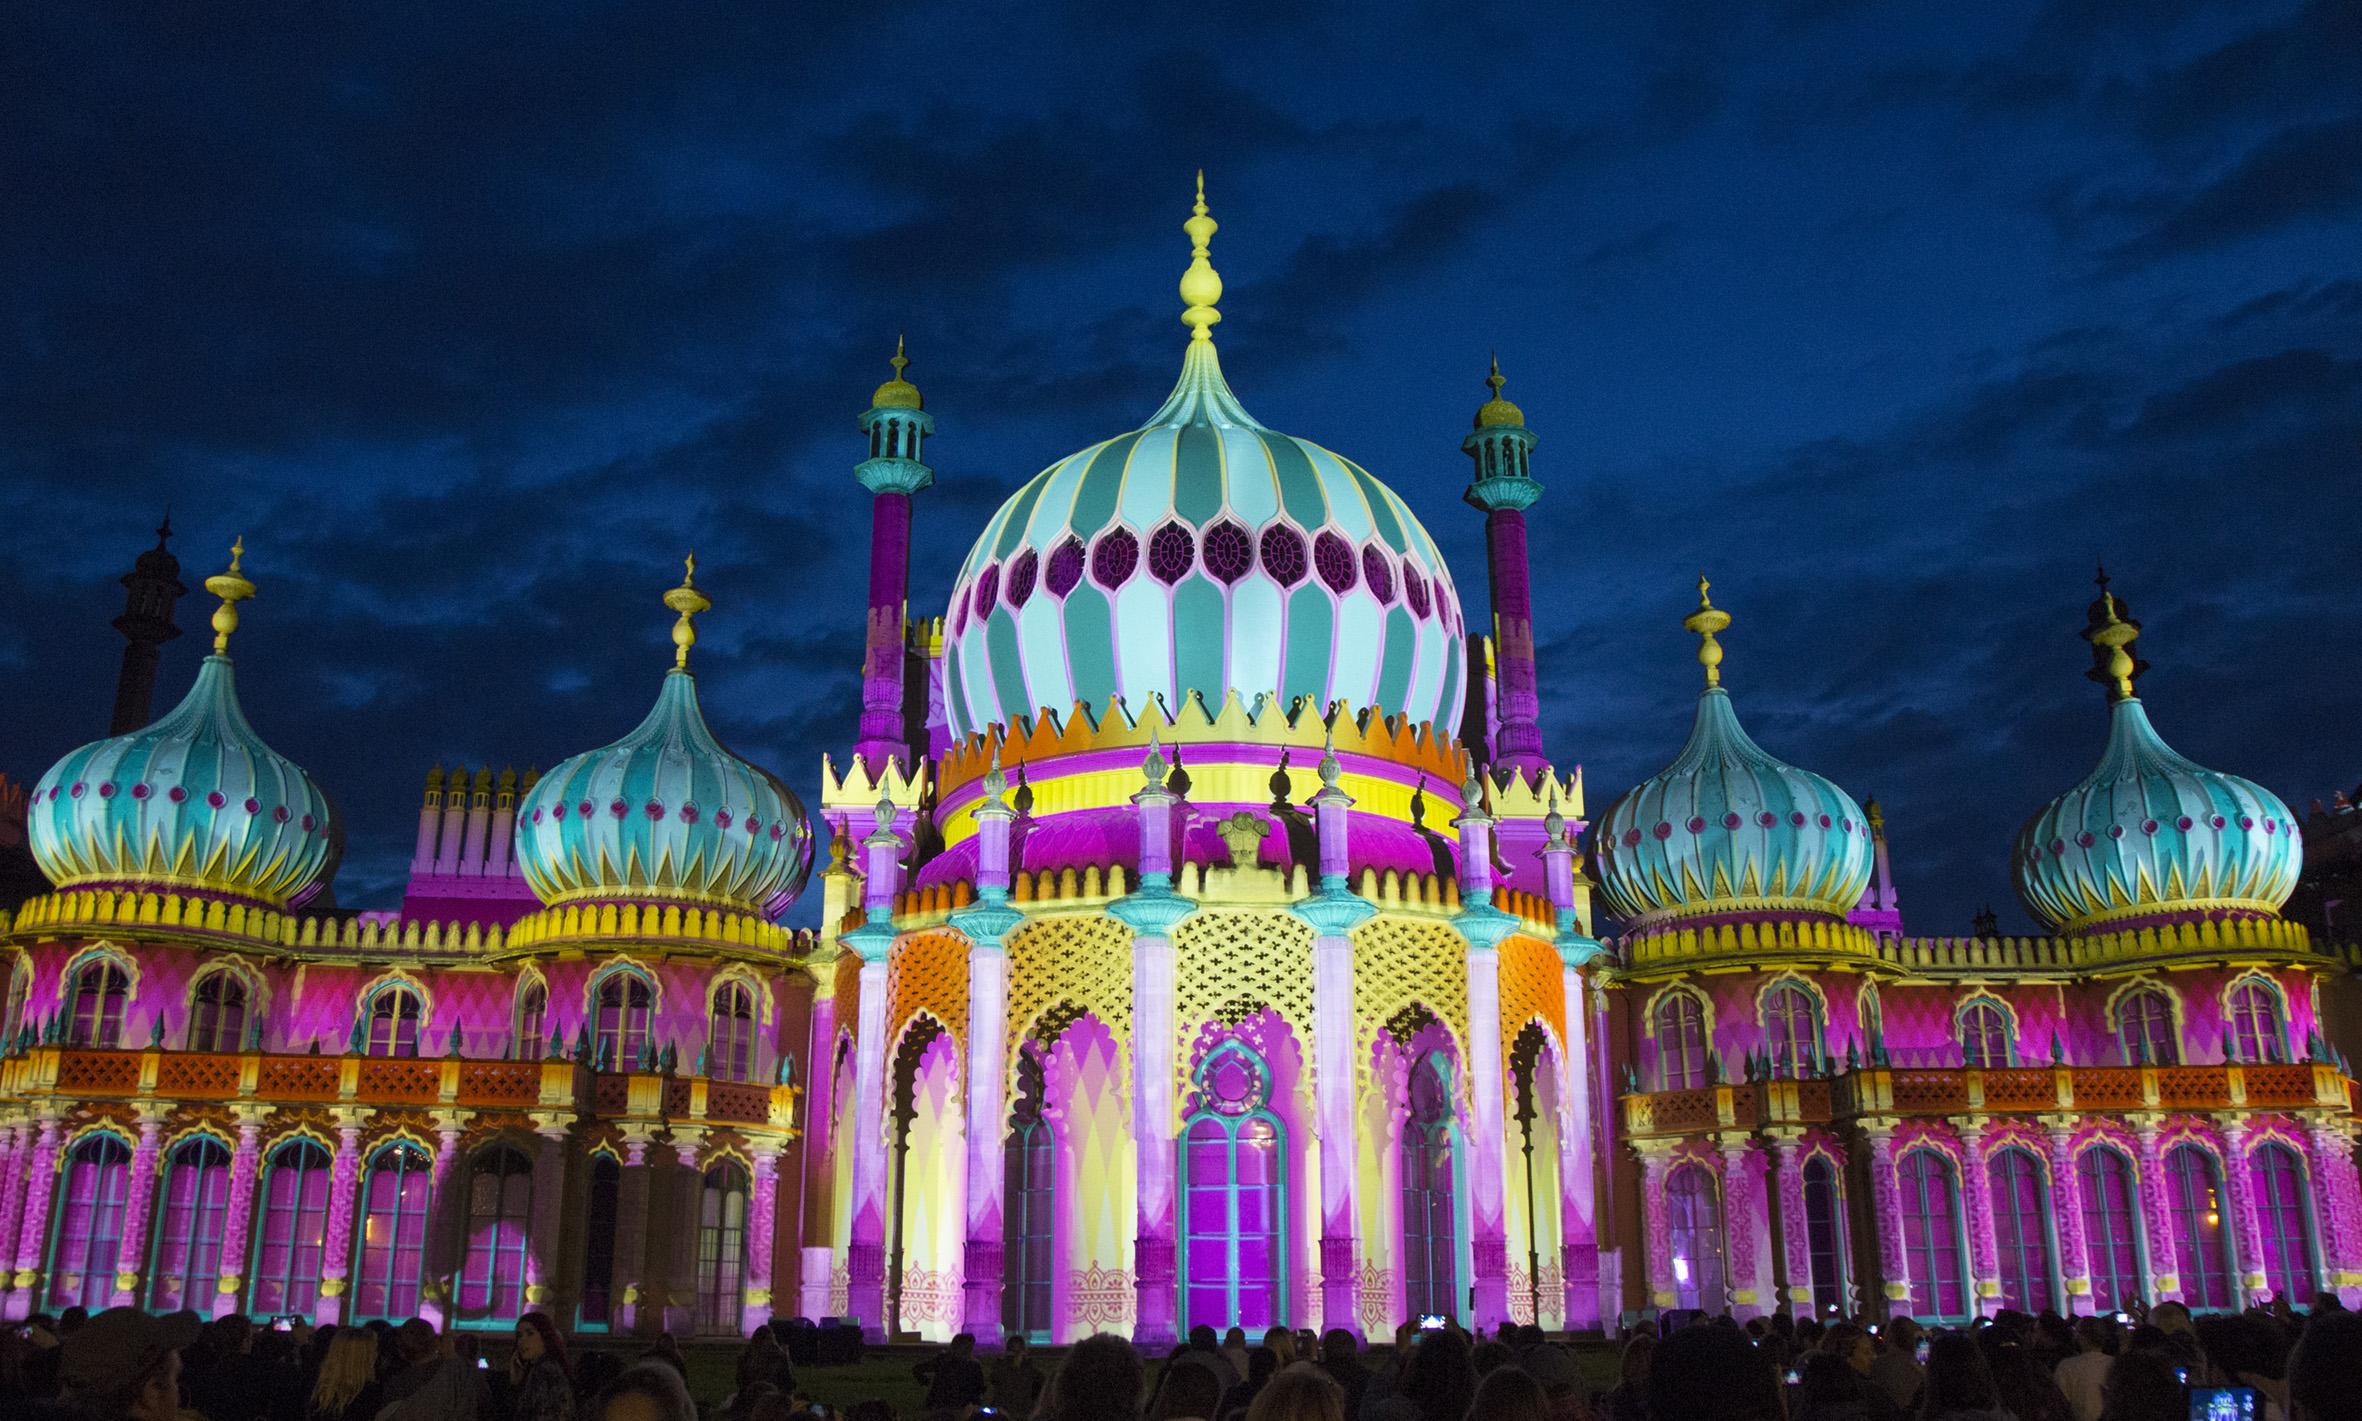 Brighton Festival Pavilion 2016